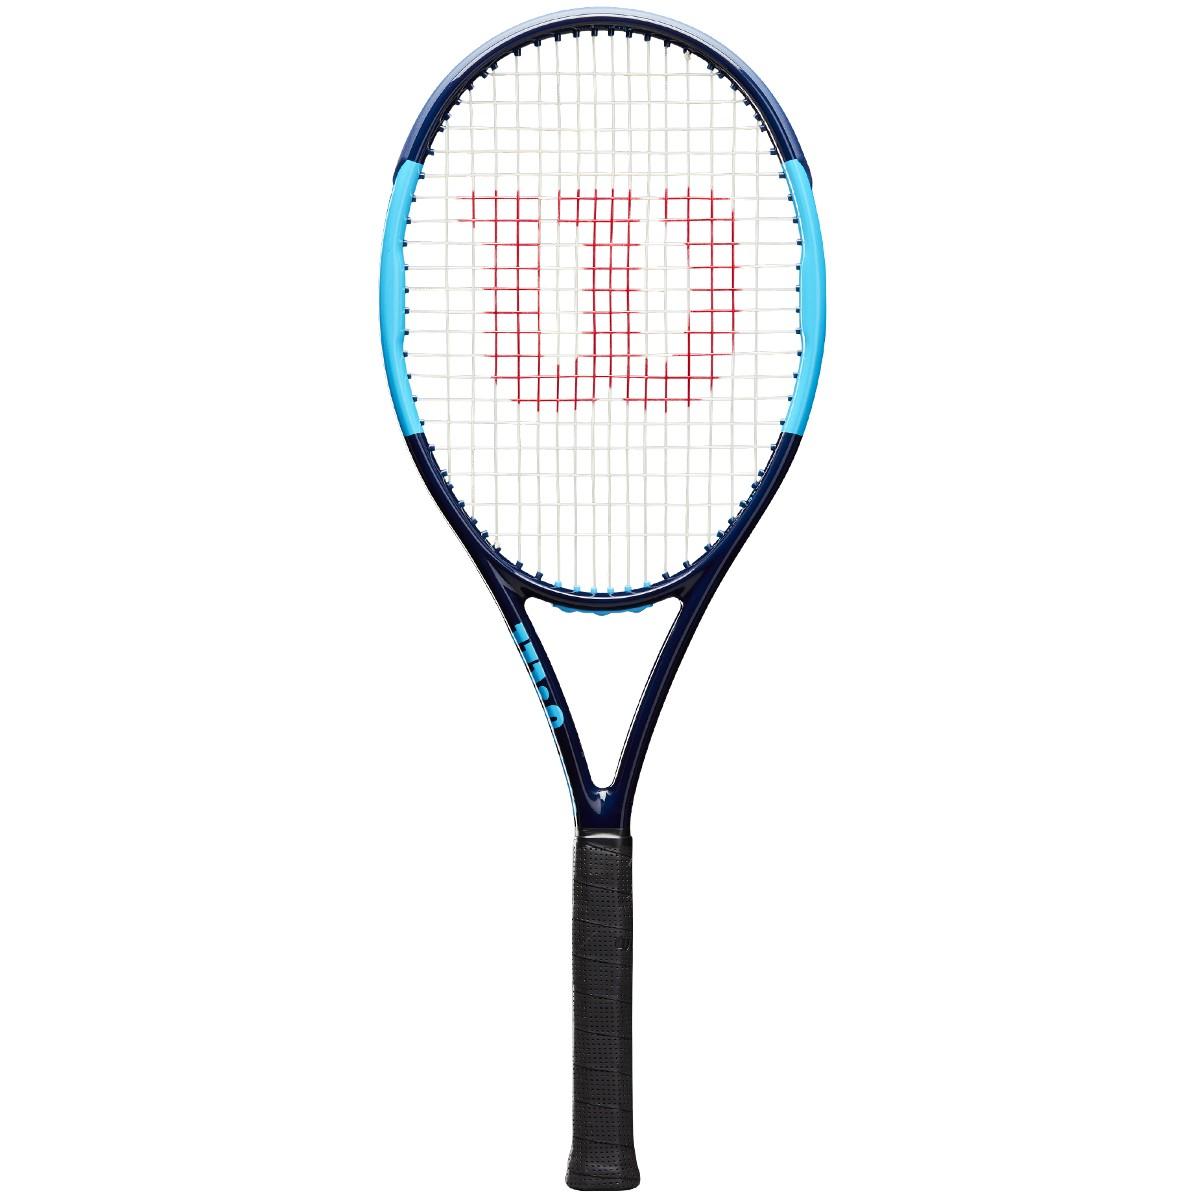 Raquette wilson ultra 95 countervail (309 gr)